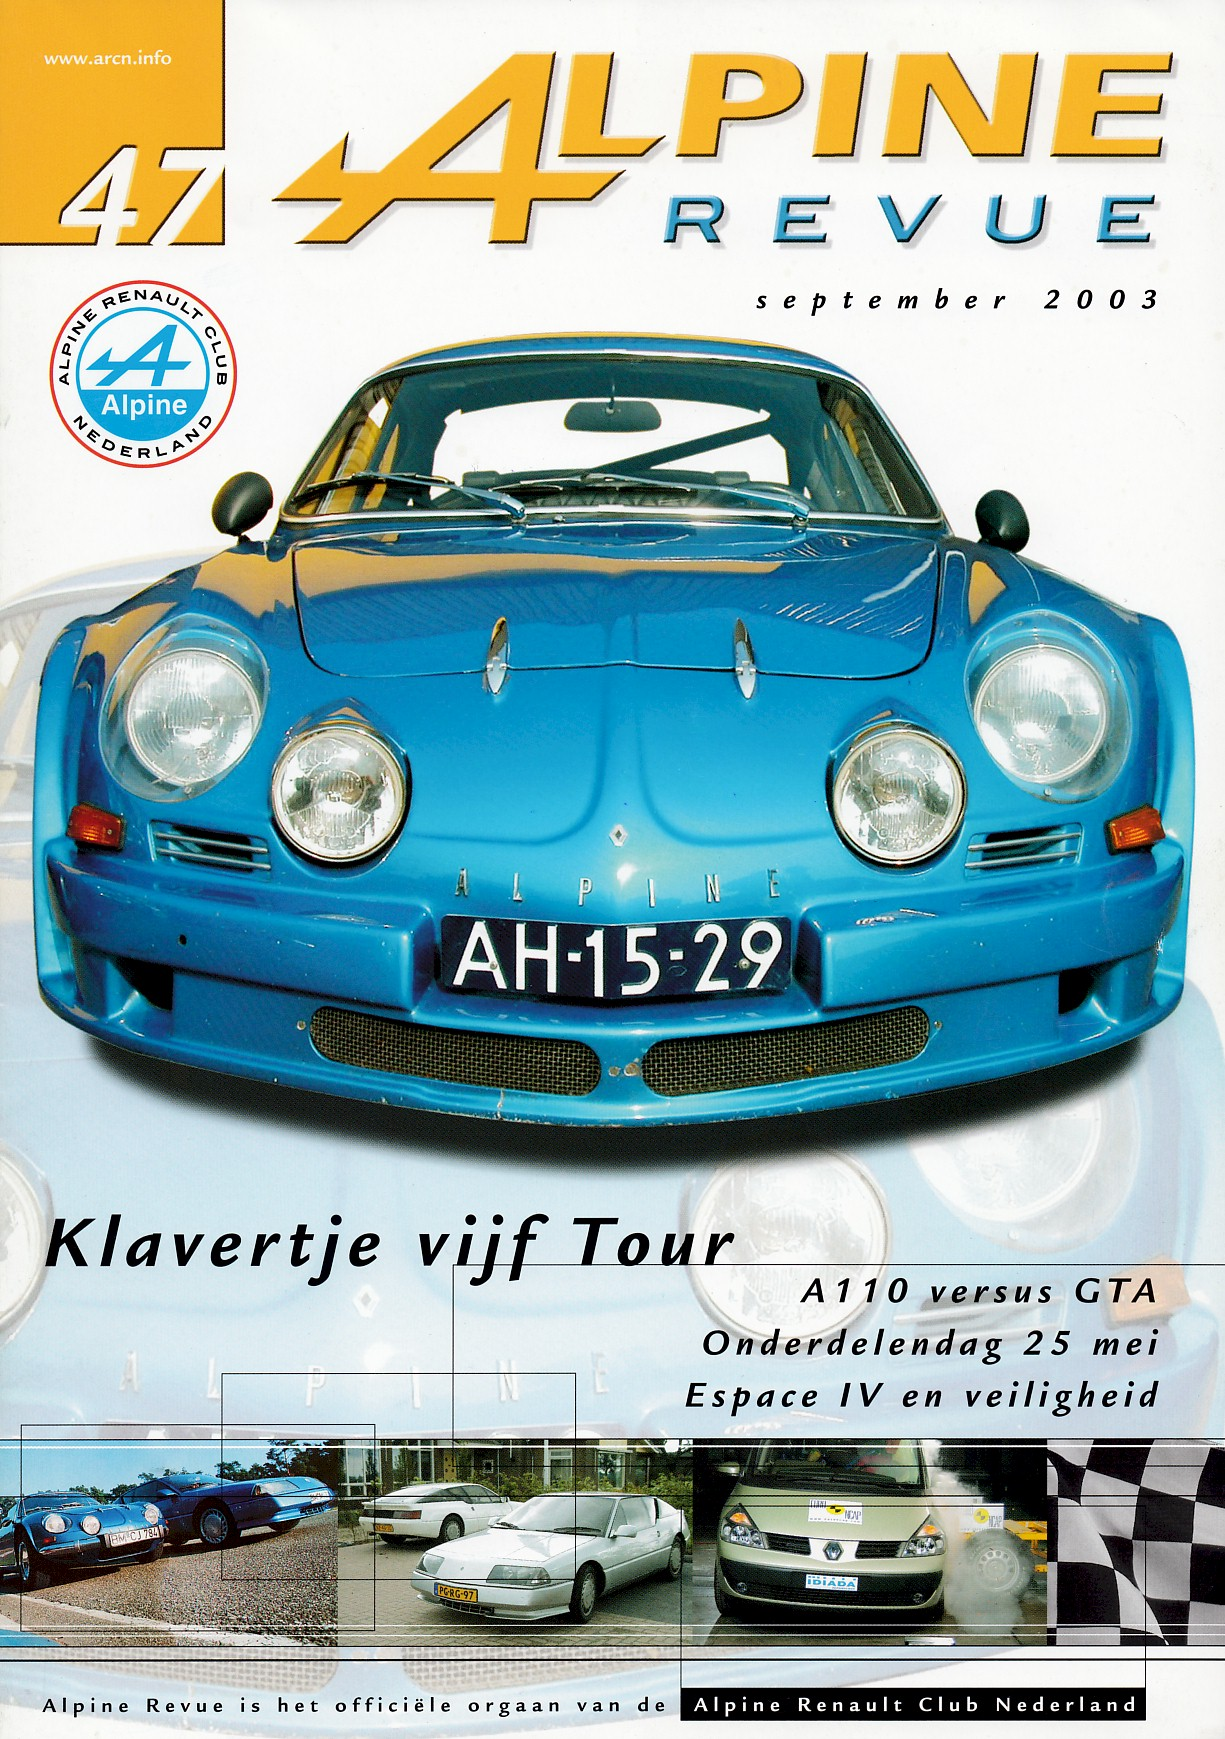 REVUE, ALPINE - Clubblad van de ARCN (Alpine Renault Club Nederland), nummer-47, september 2003